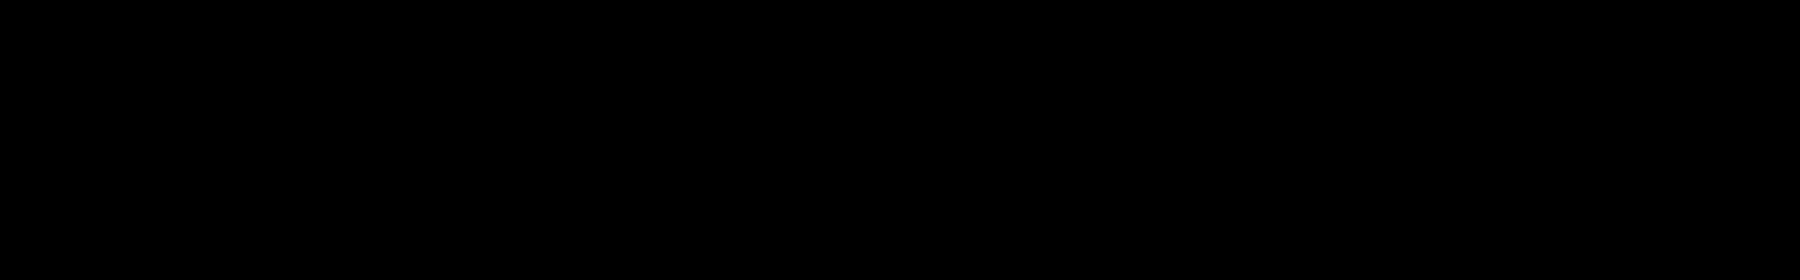 AudioKaviar 04: Hip Hop & Drill for Ableton Live 11 audio waveform